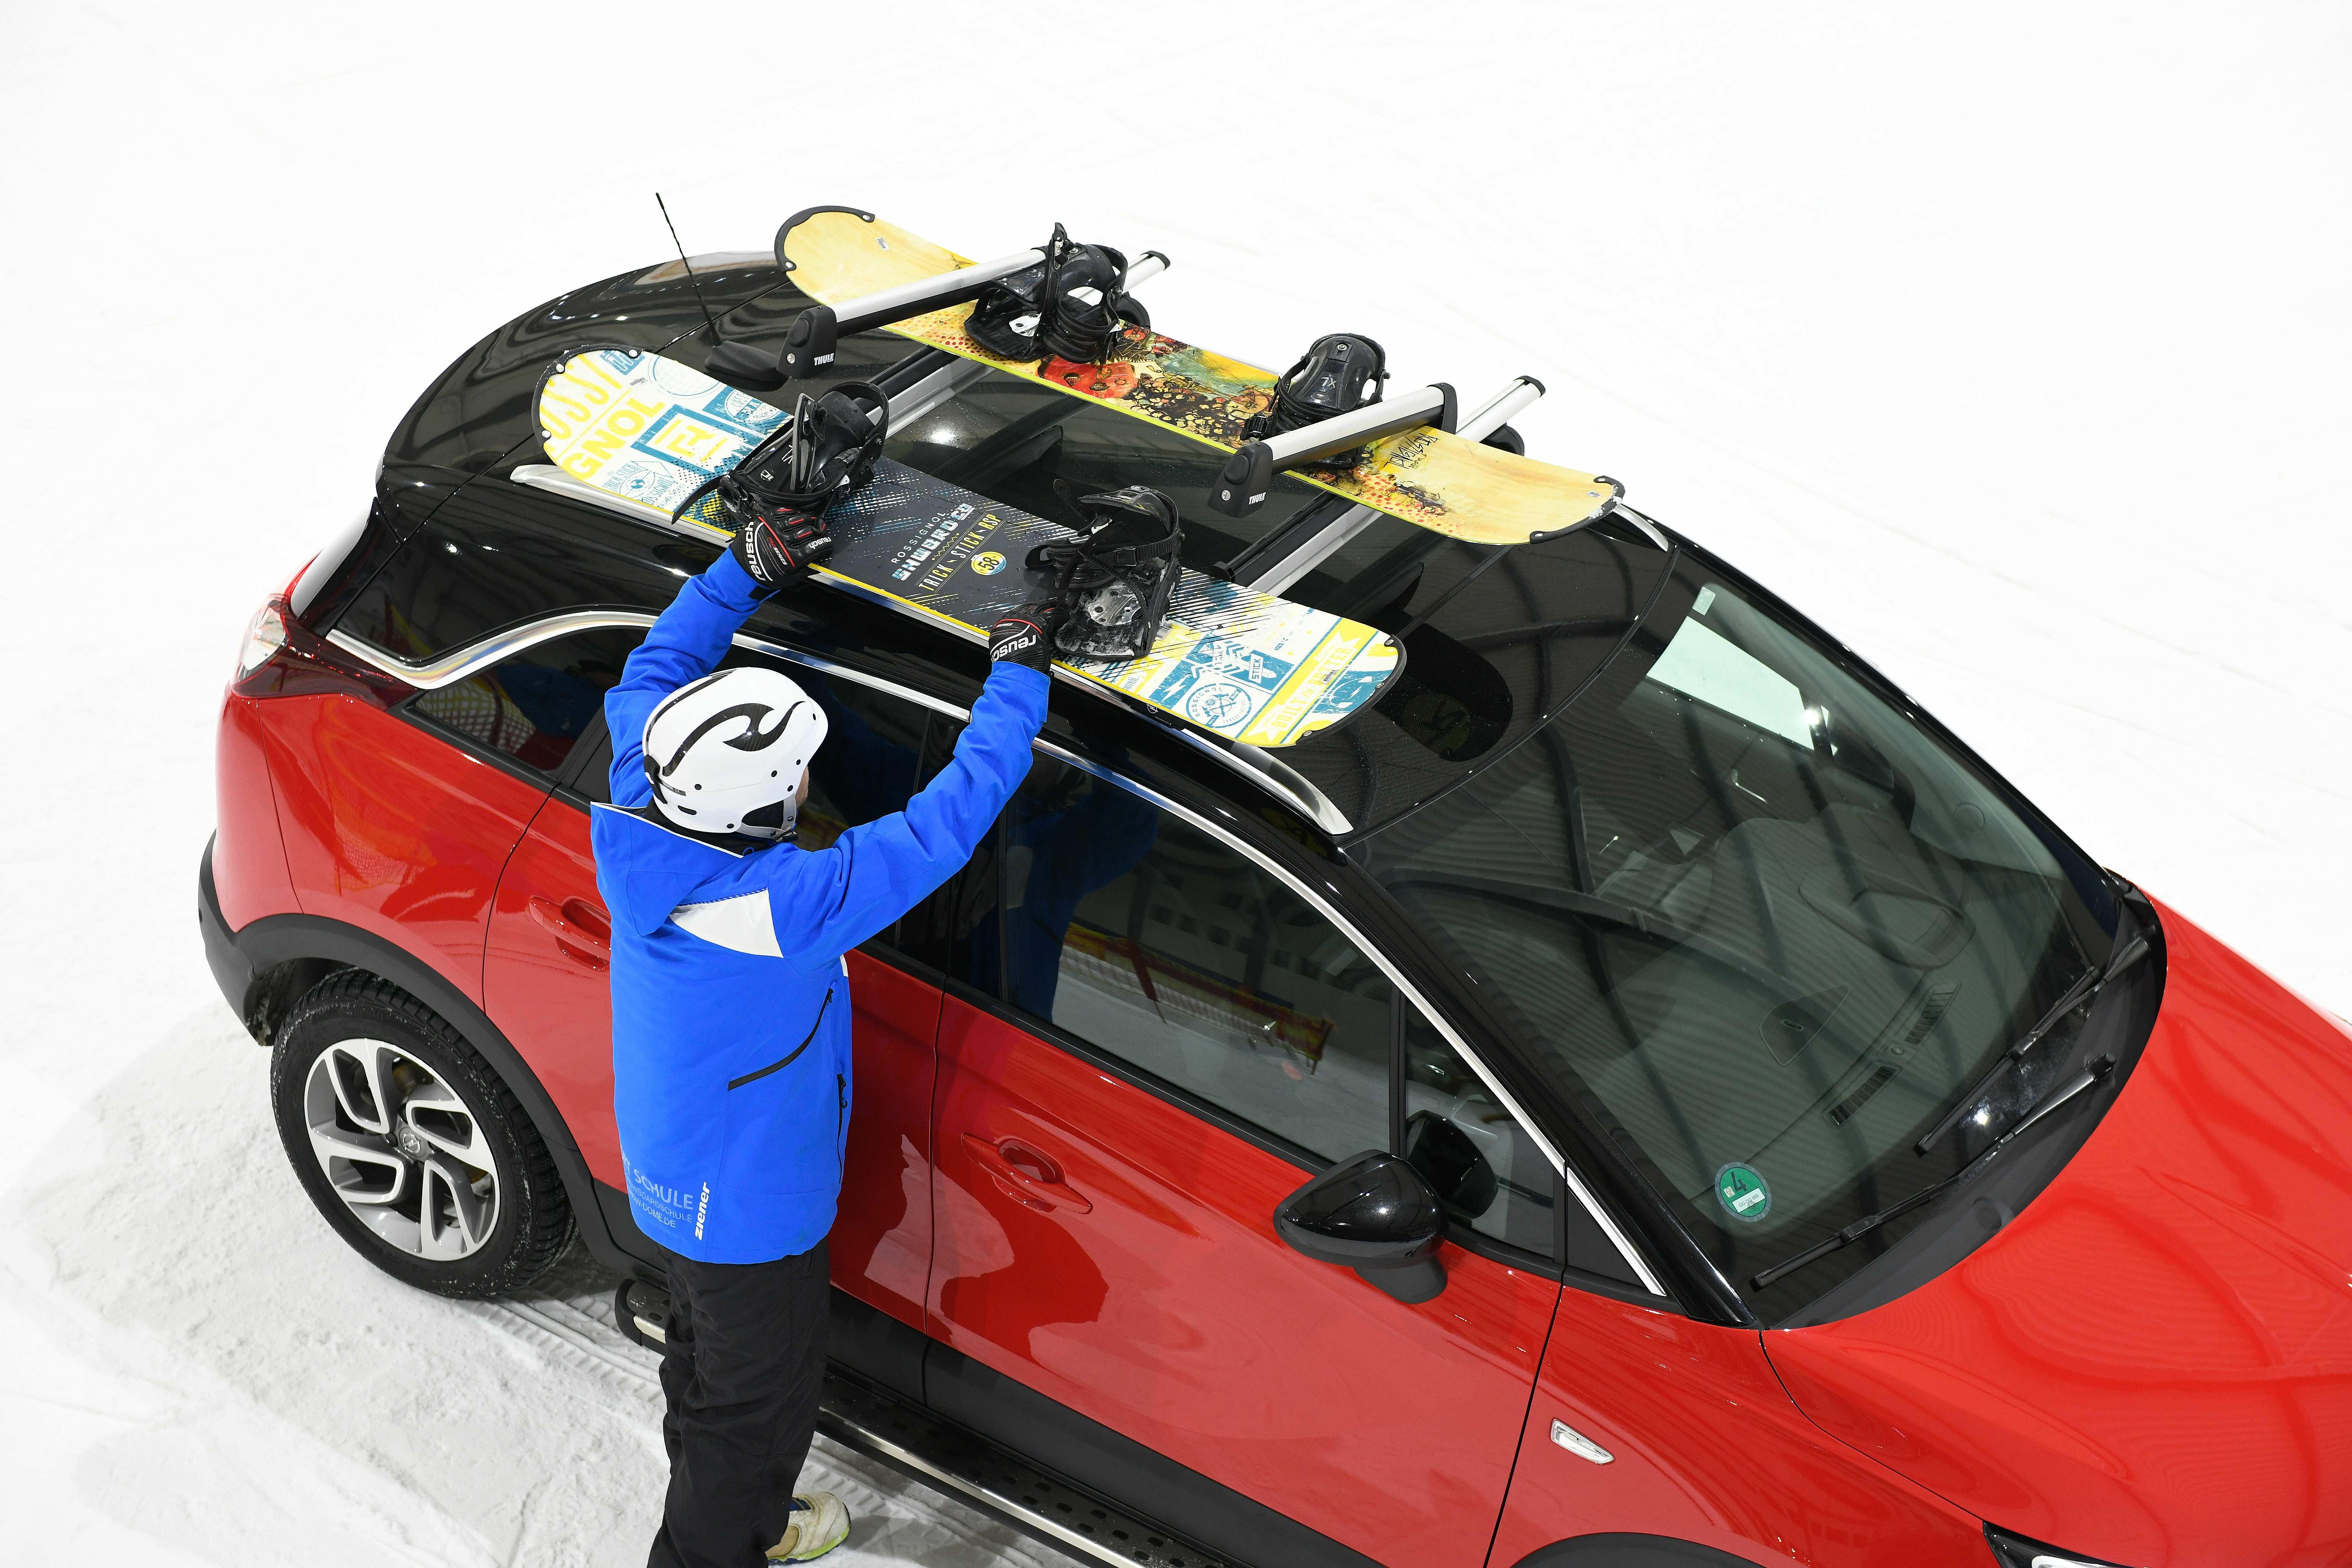 Non-brand Haube Gasdruckd/ämpfer Gasdruckfeder F/ür Toyota Landcruiser Prado 120 Serie